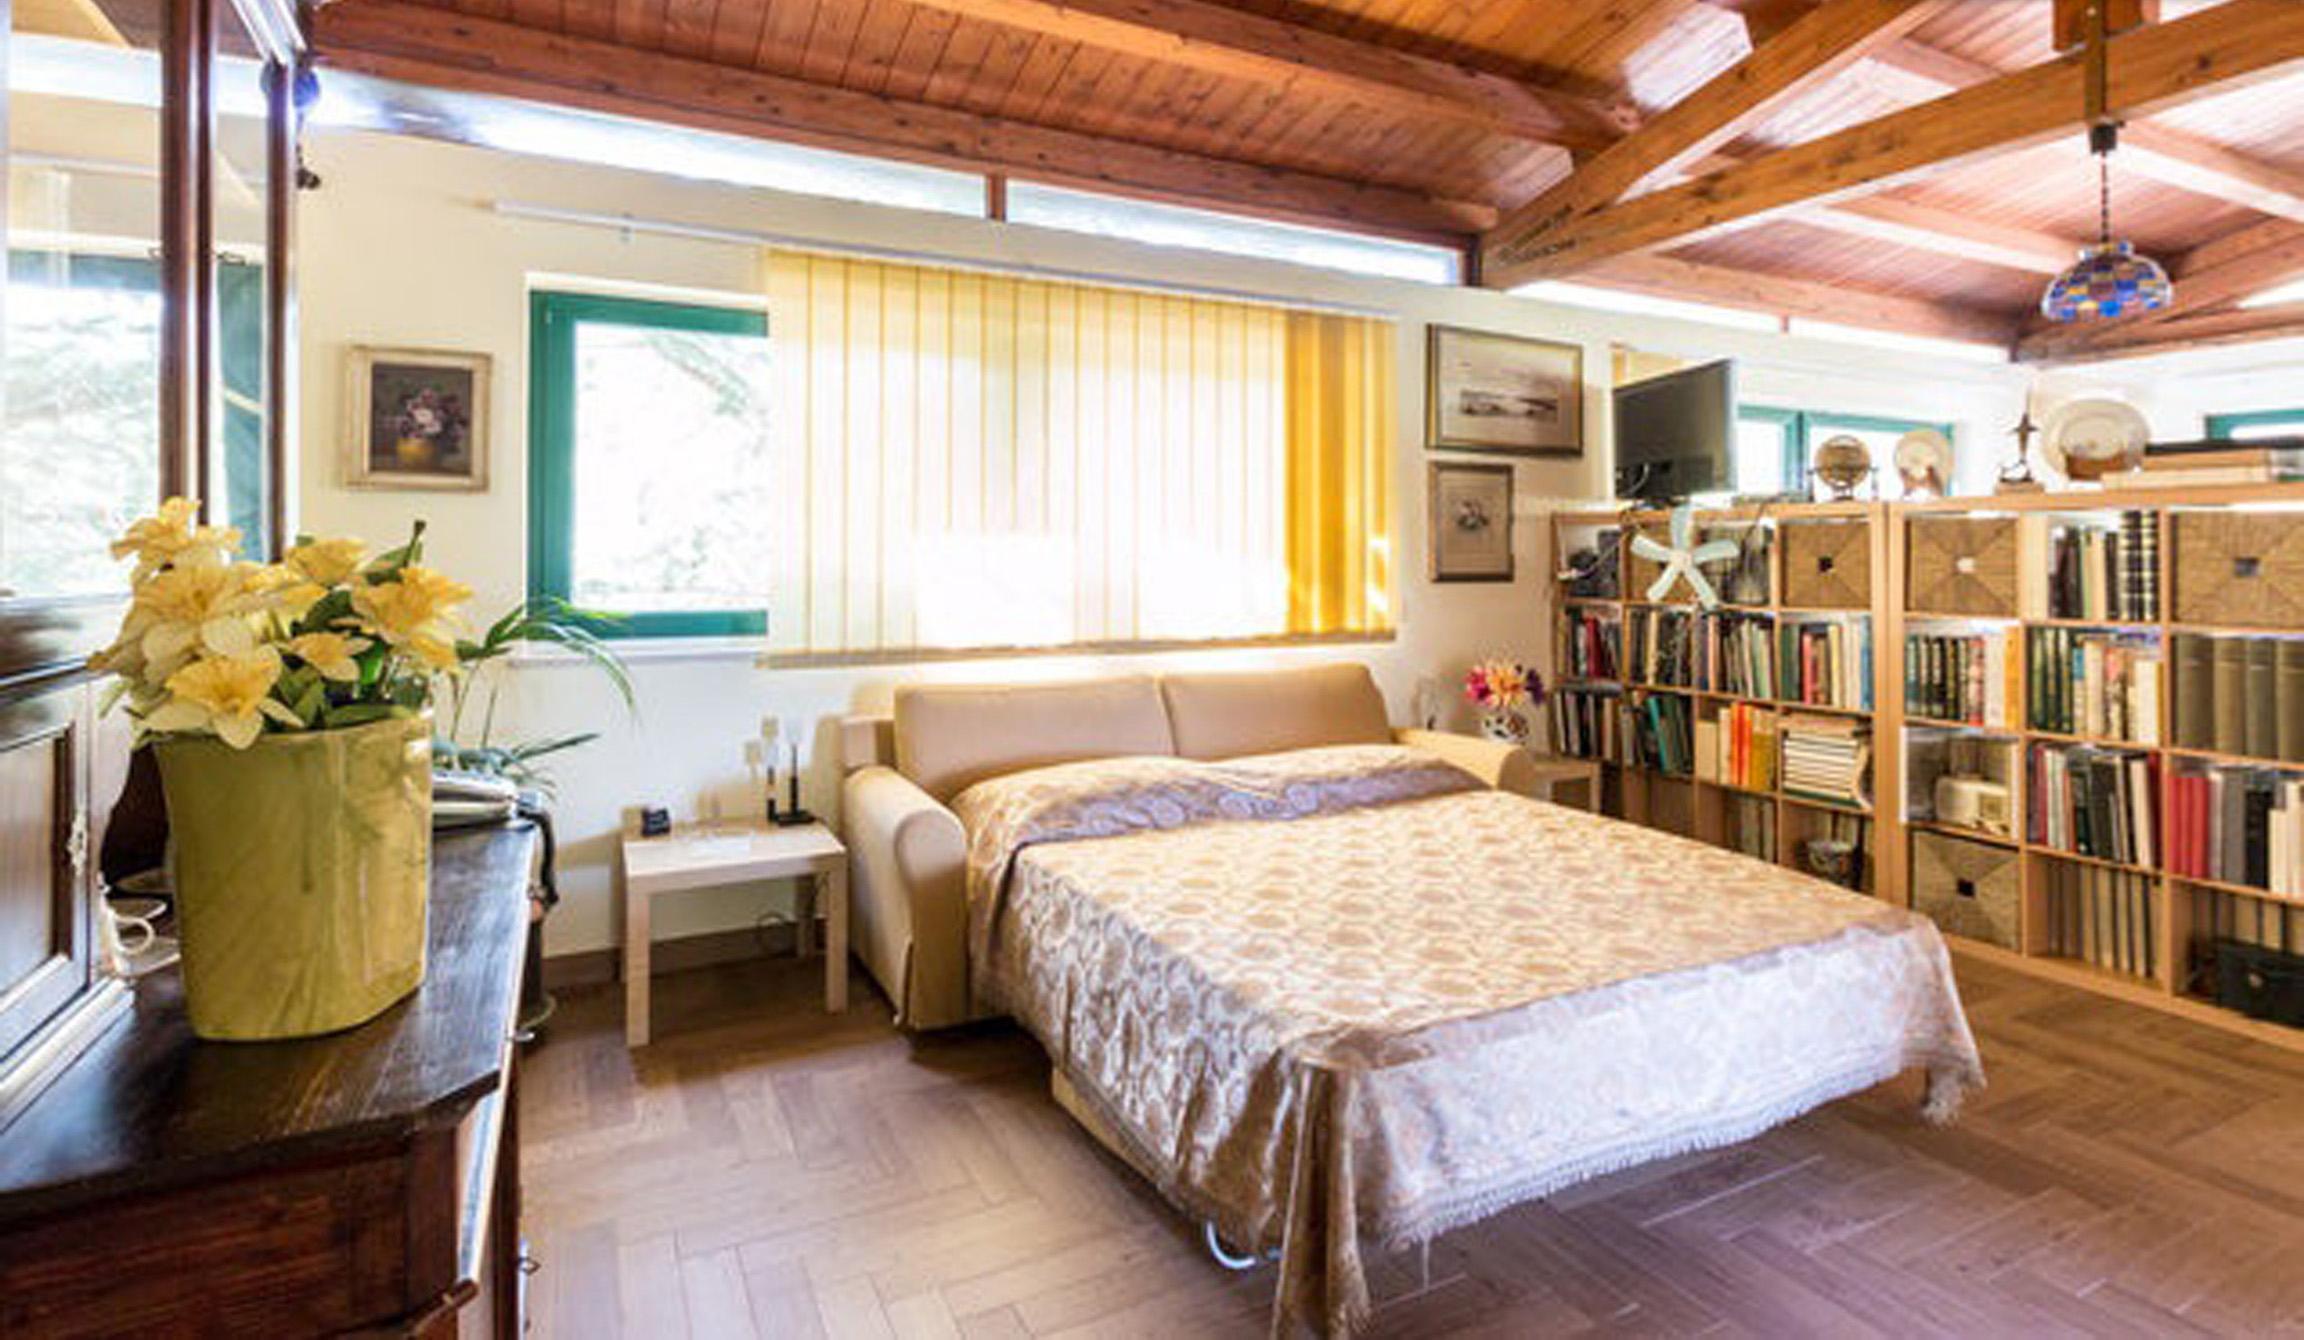 Appartement de vacances Bellavista (1730194), Modica, Ragusa, Sicile, Italie, image 2